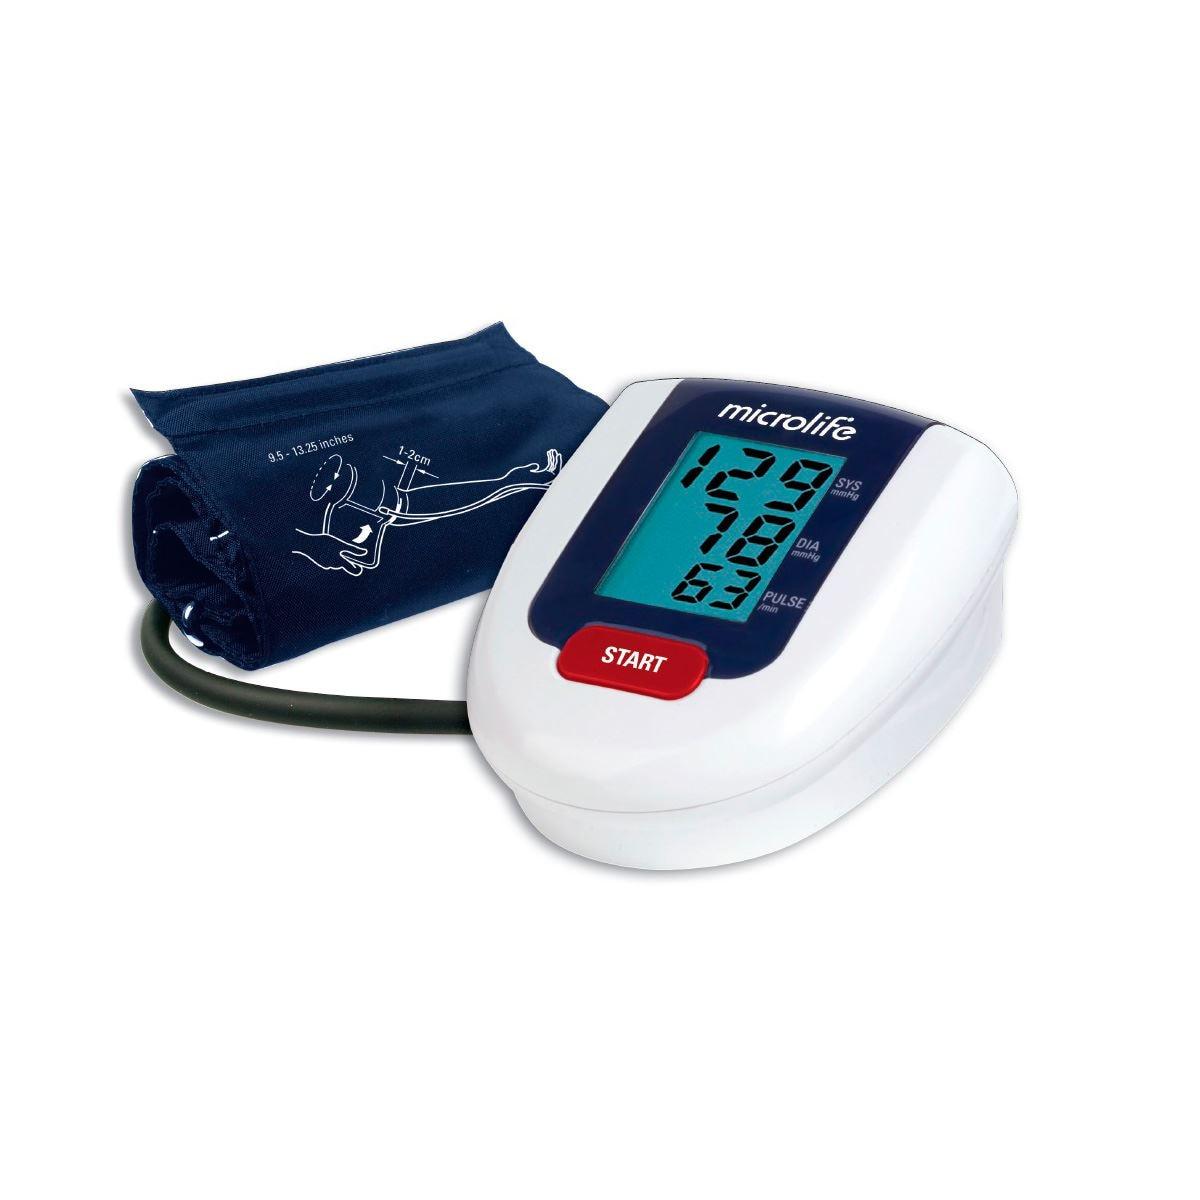 Baumanometro digital de brazo  - Sanborns